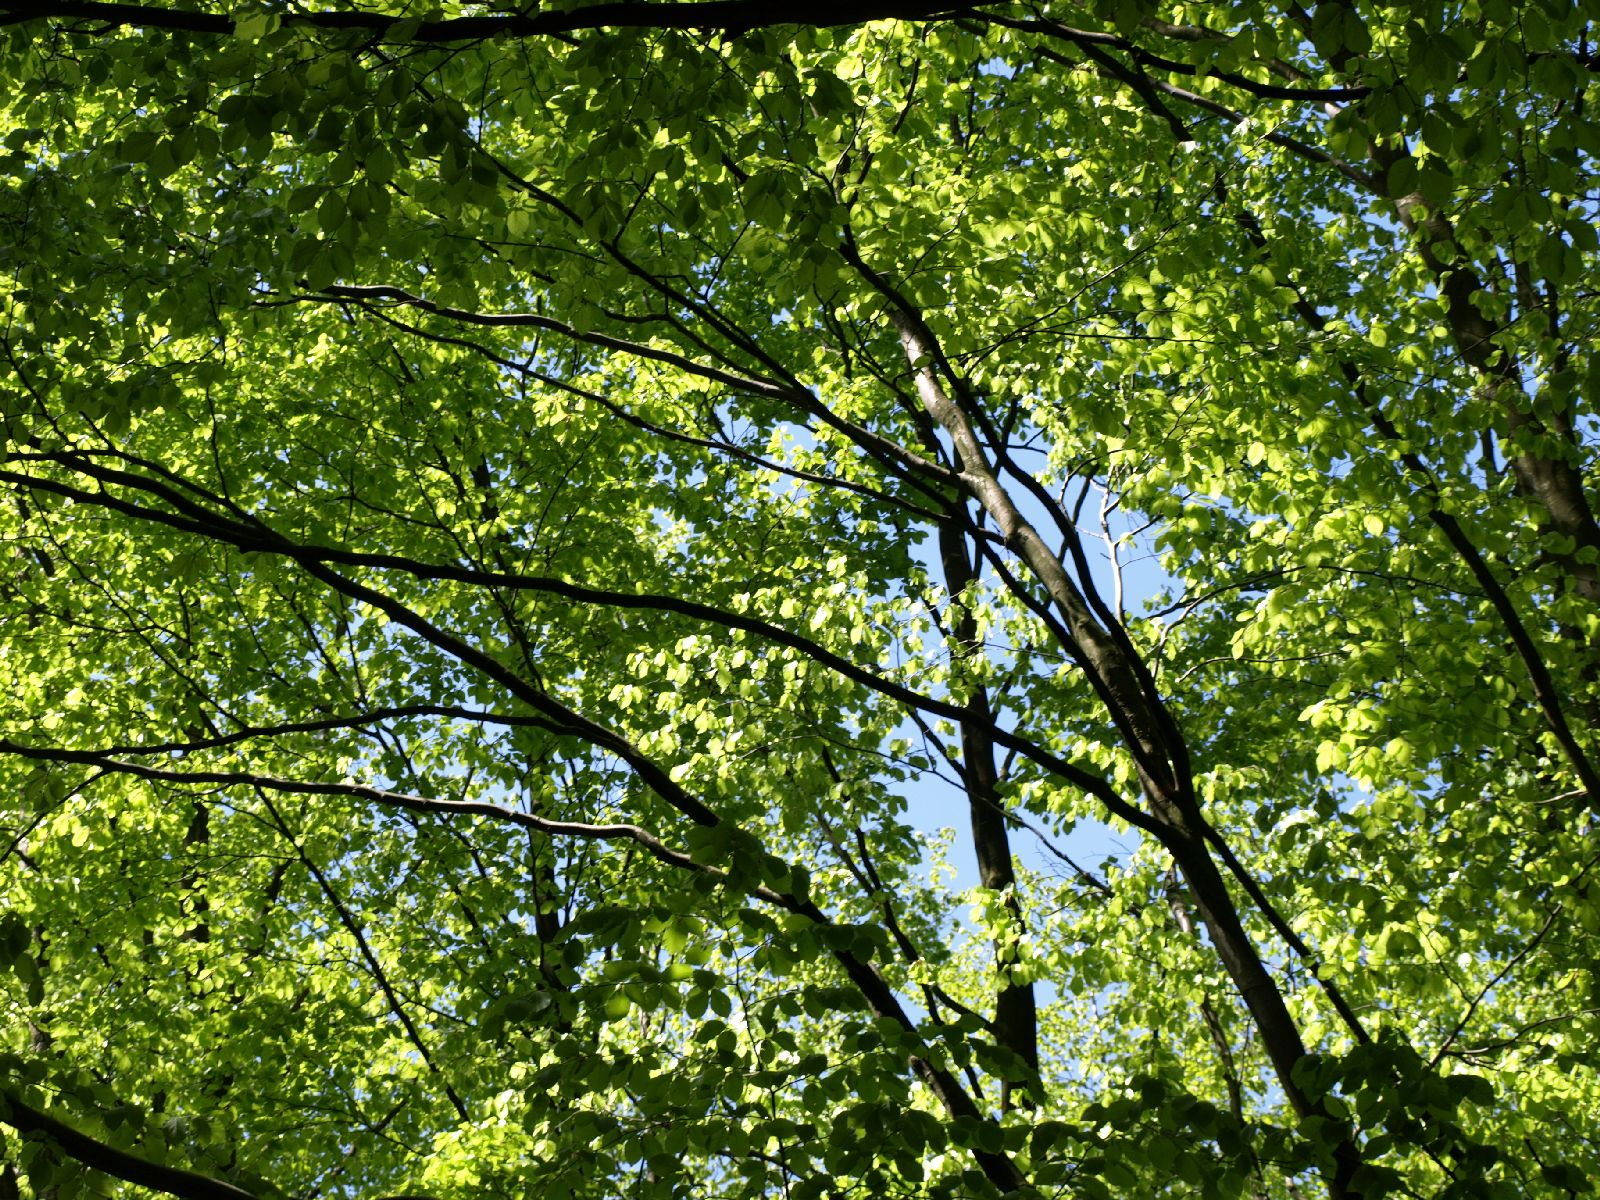 Plants-Trees_Photo_Texture_B_P5042460